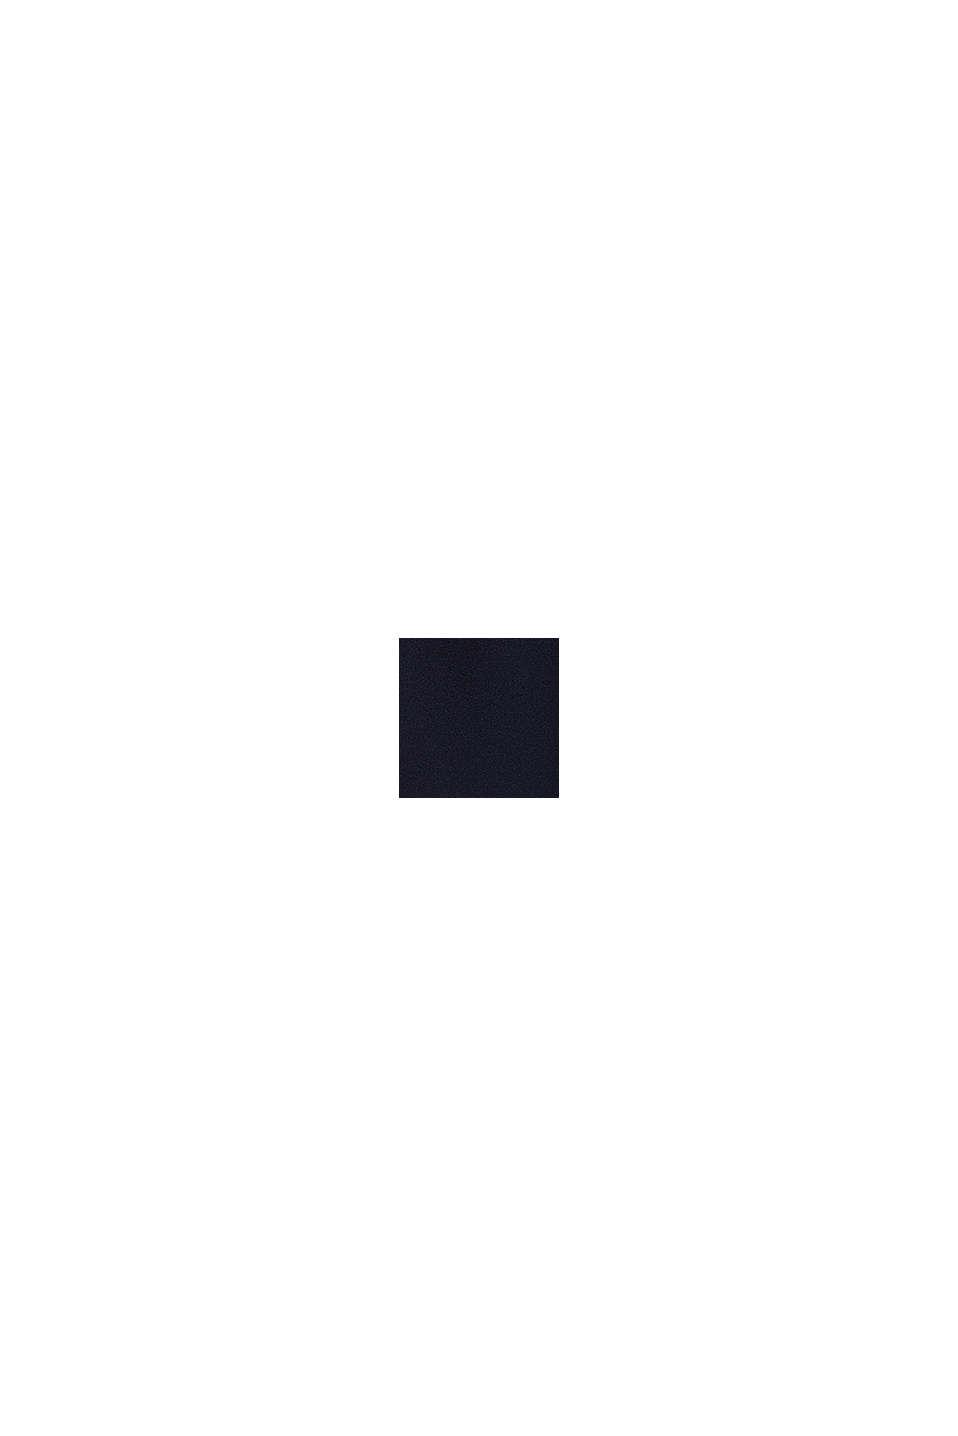 Jumpsuit av crêpe i culottemodell, NAVY, swatch